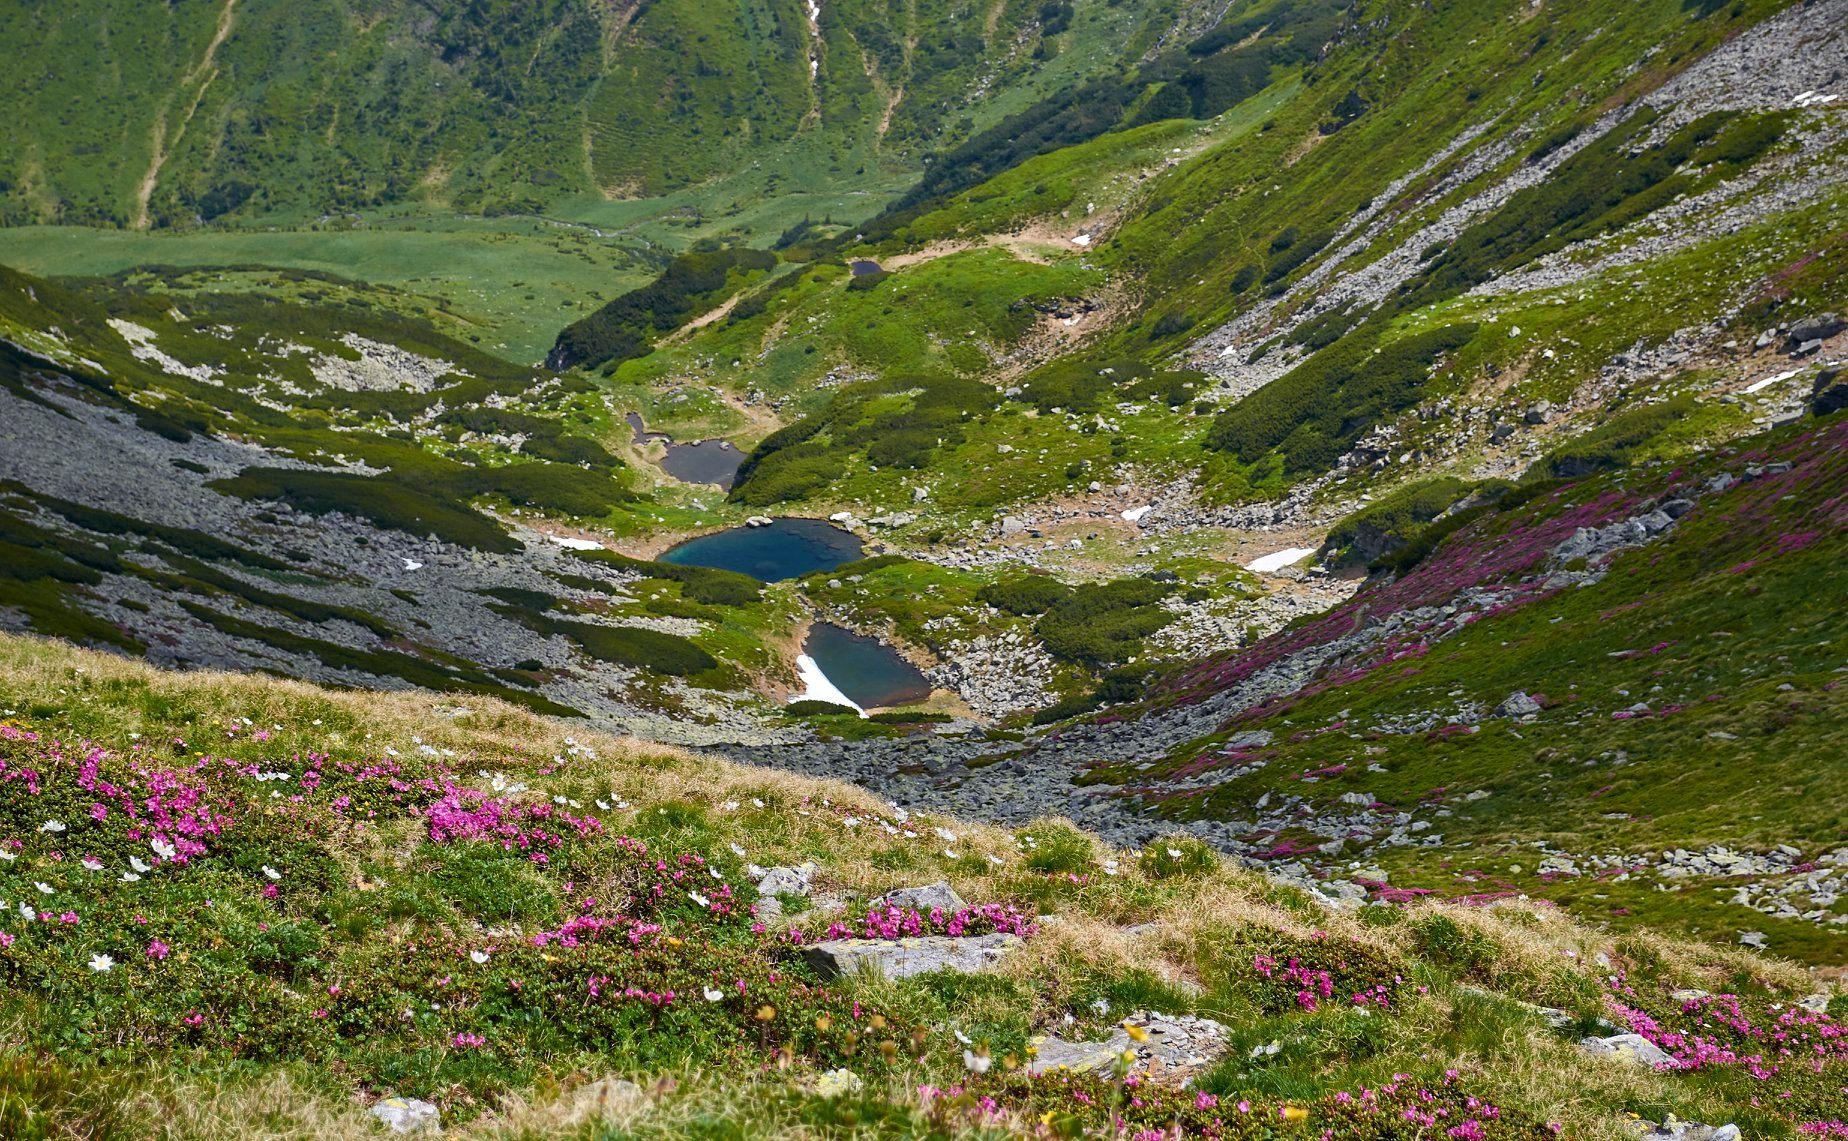 Bujori in apropiere de Taurile Buhaescu - Robert Dogaru